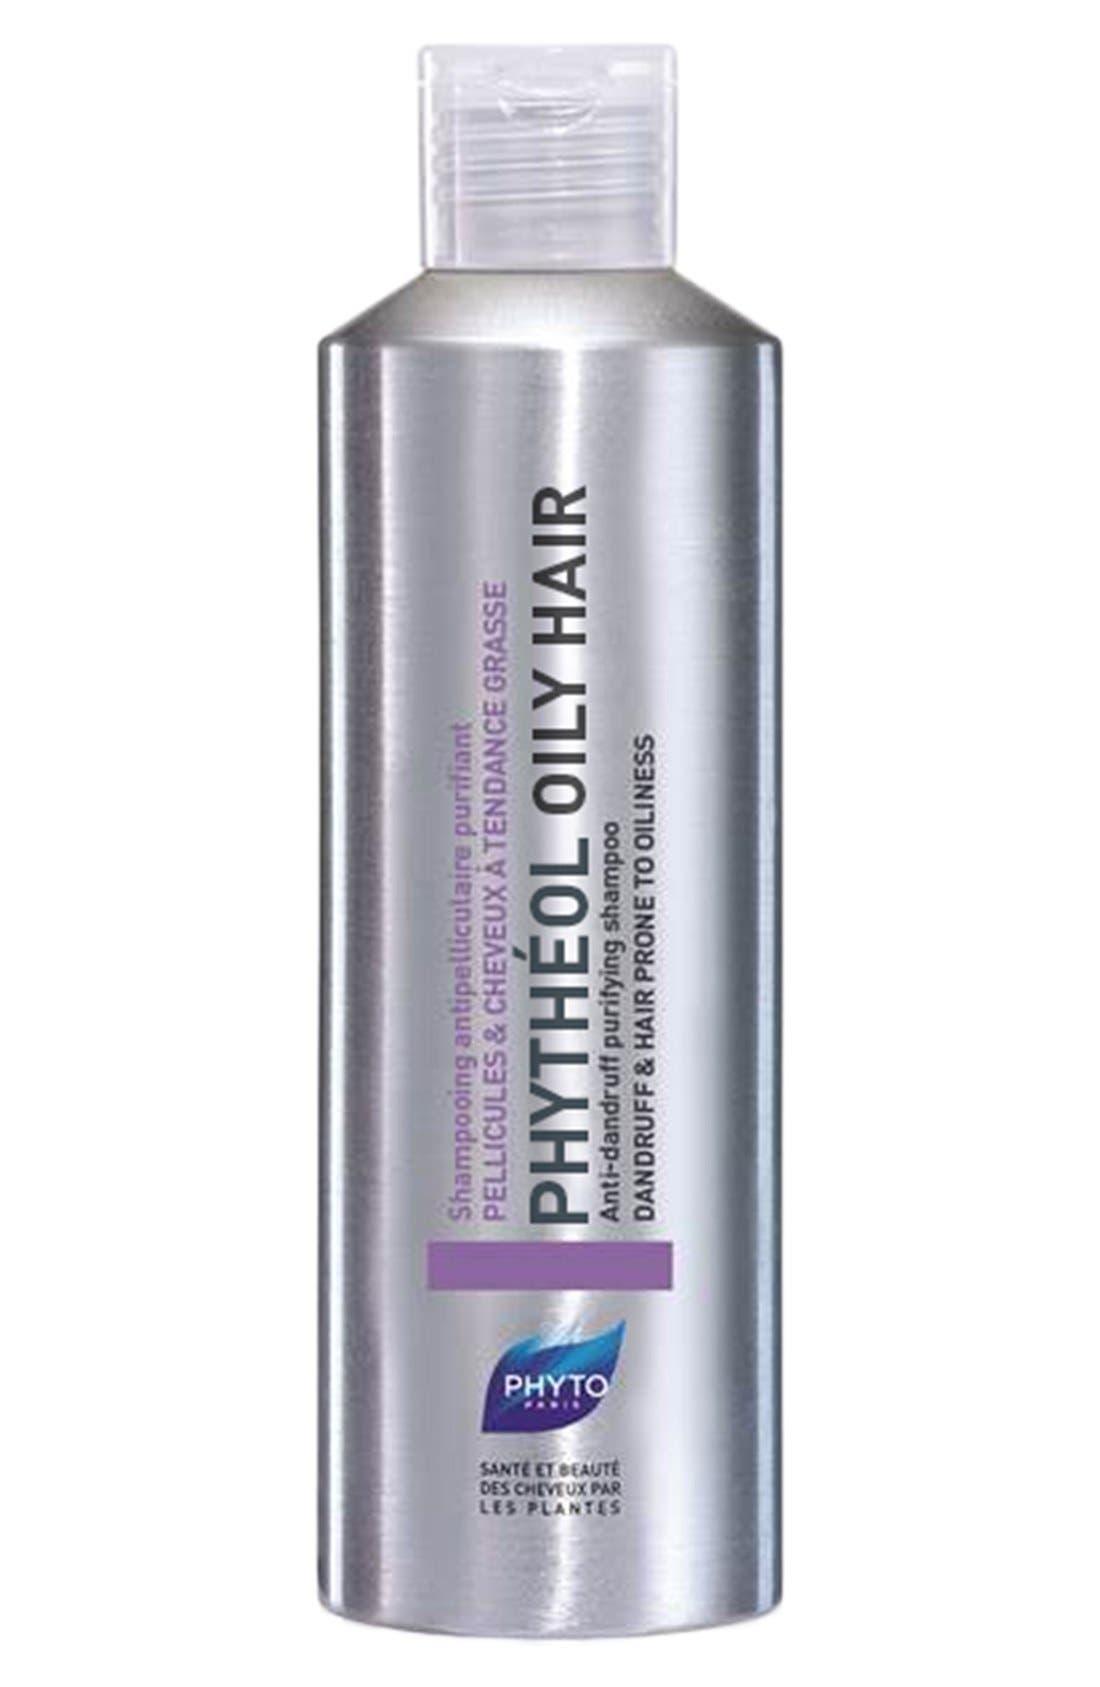 PHYTO Phythéol Oily Hair Anti-Dandruff Purifying Shampoo